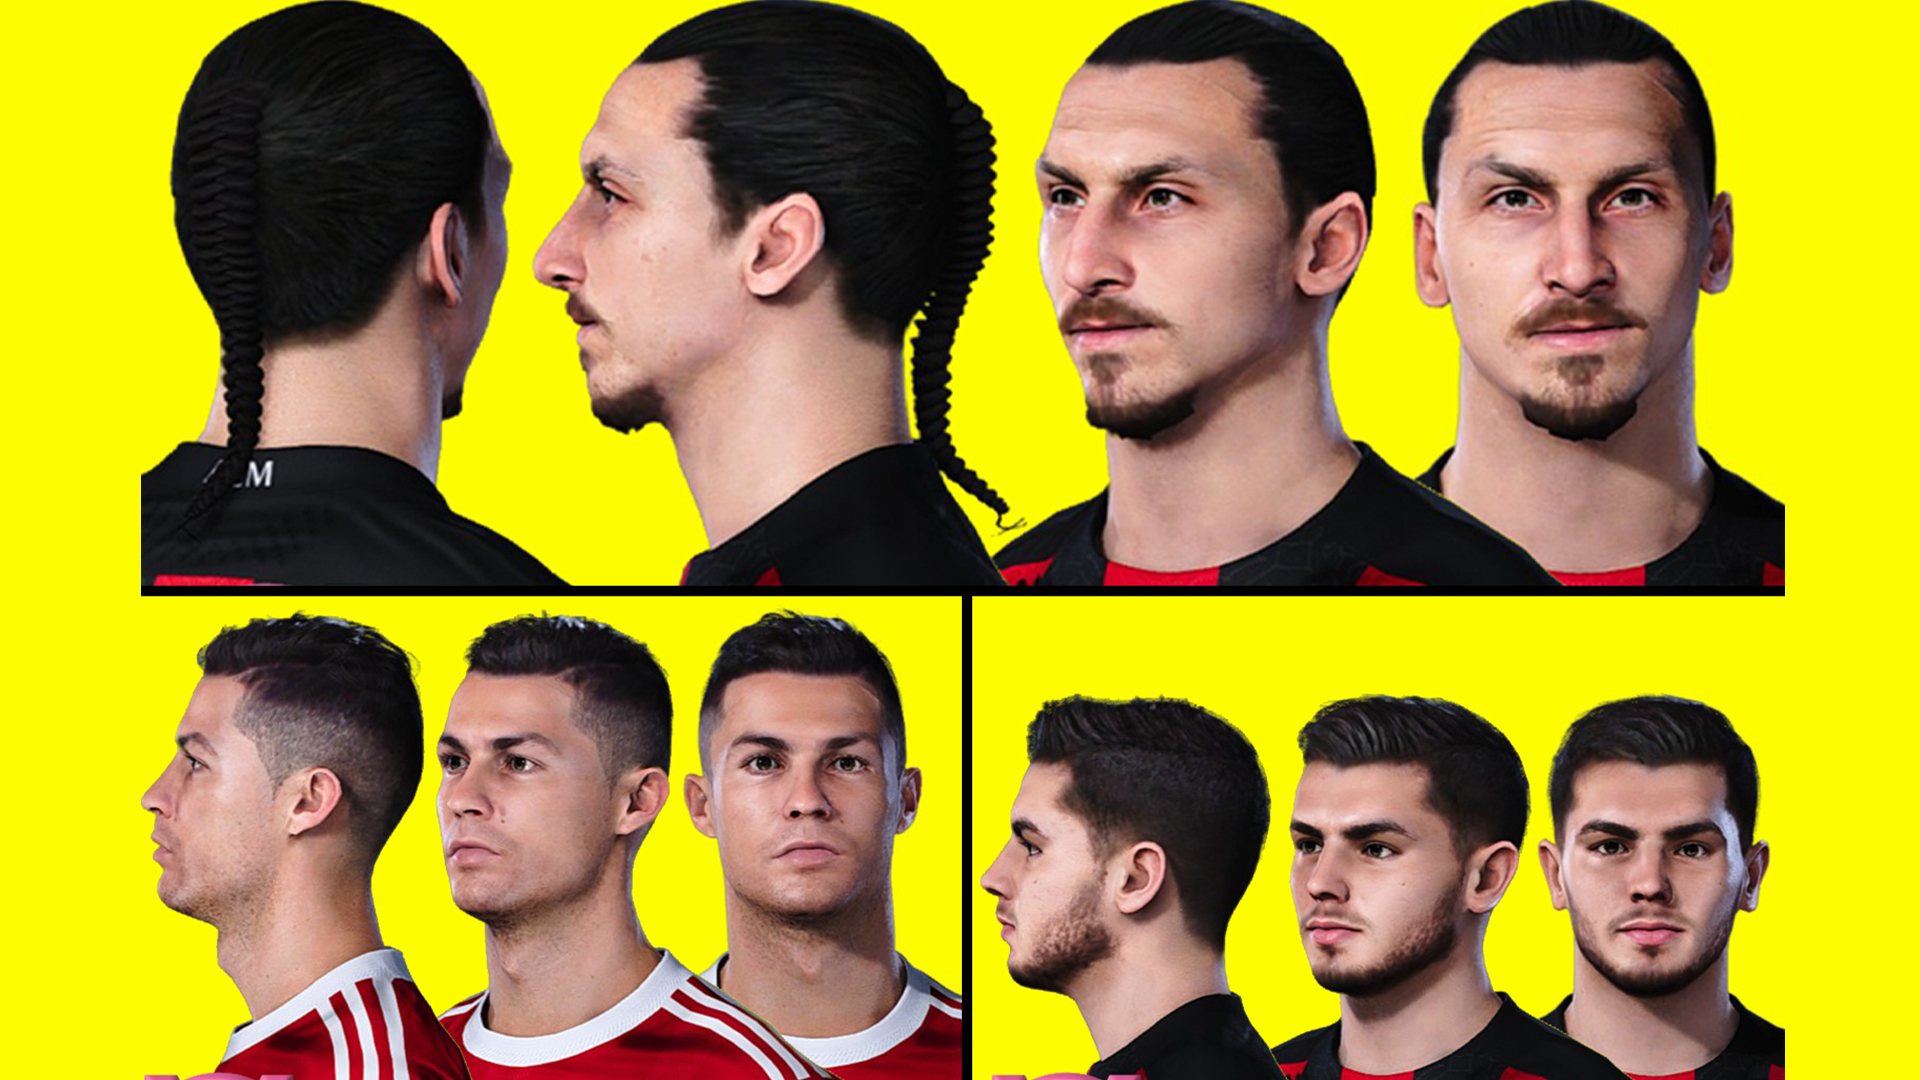 PES 2021 Faces Cristiano Ronaldo, Brahim Diaz, and Zlatan Ibrahimovic